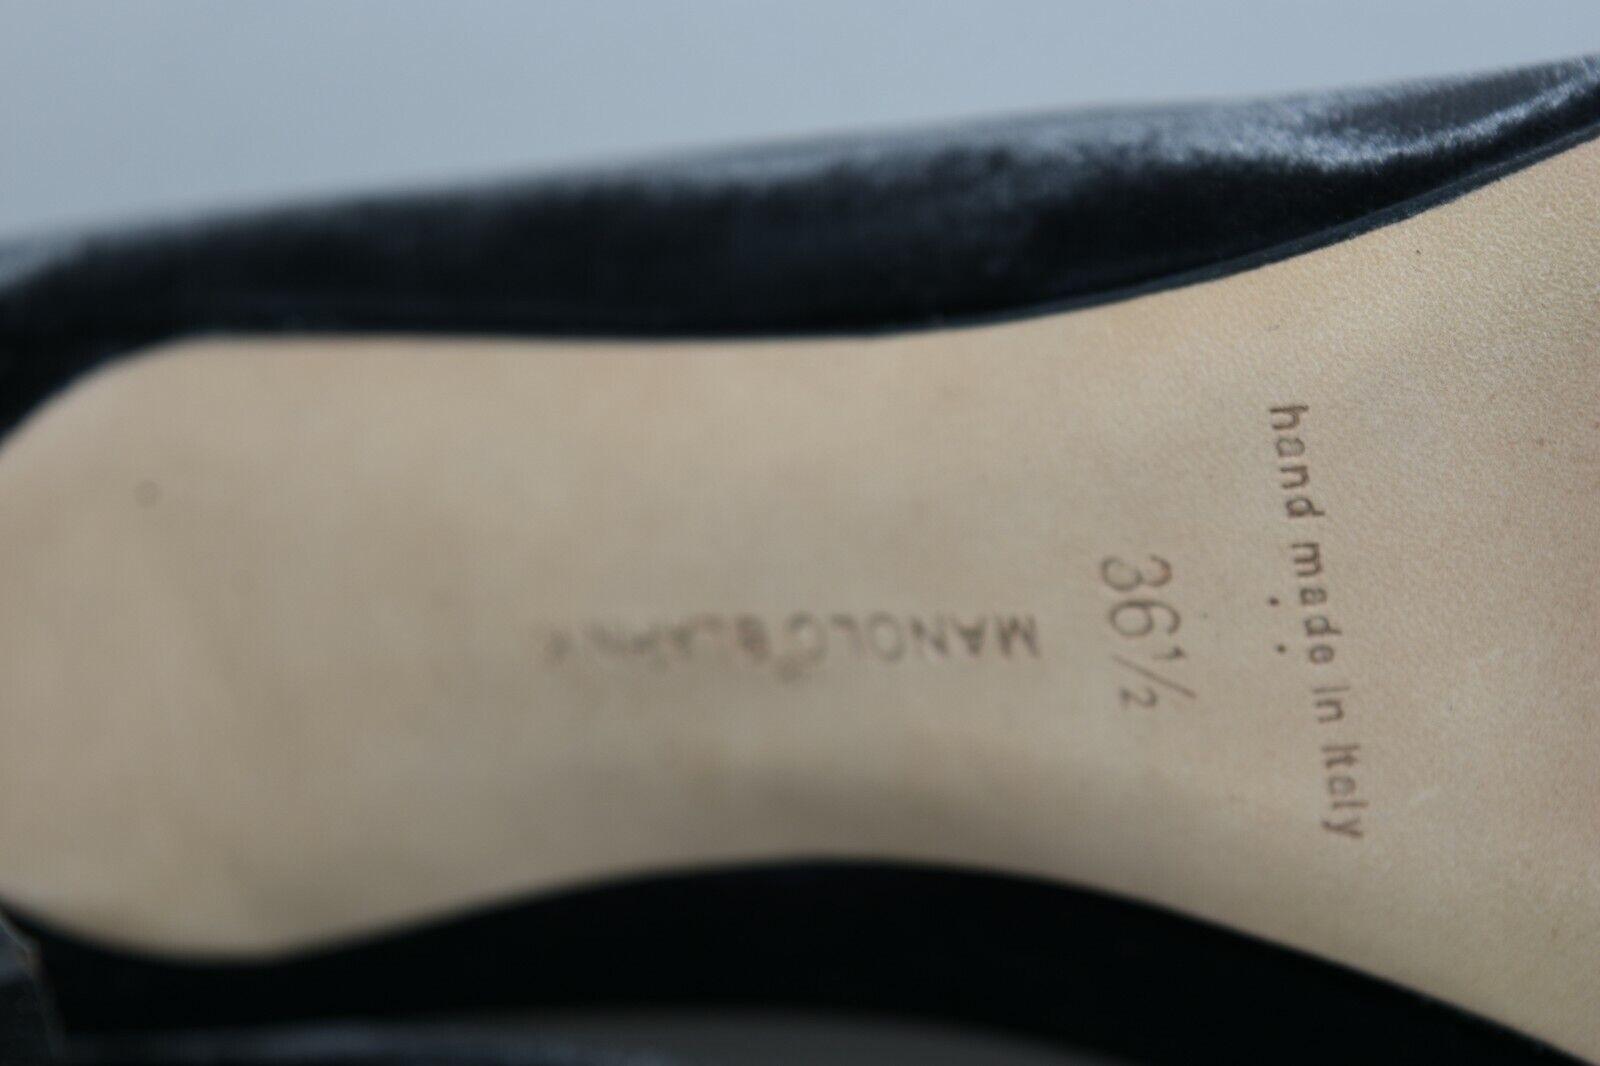 695 695 695 NEW Manolo Blahnik BB 105 Pumps VELVET Heels Grey 35 35.5 36.36.5 39 40 41 3489fc